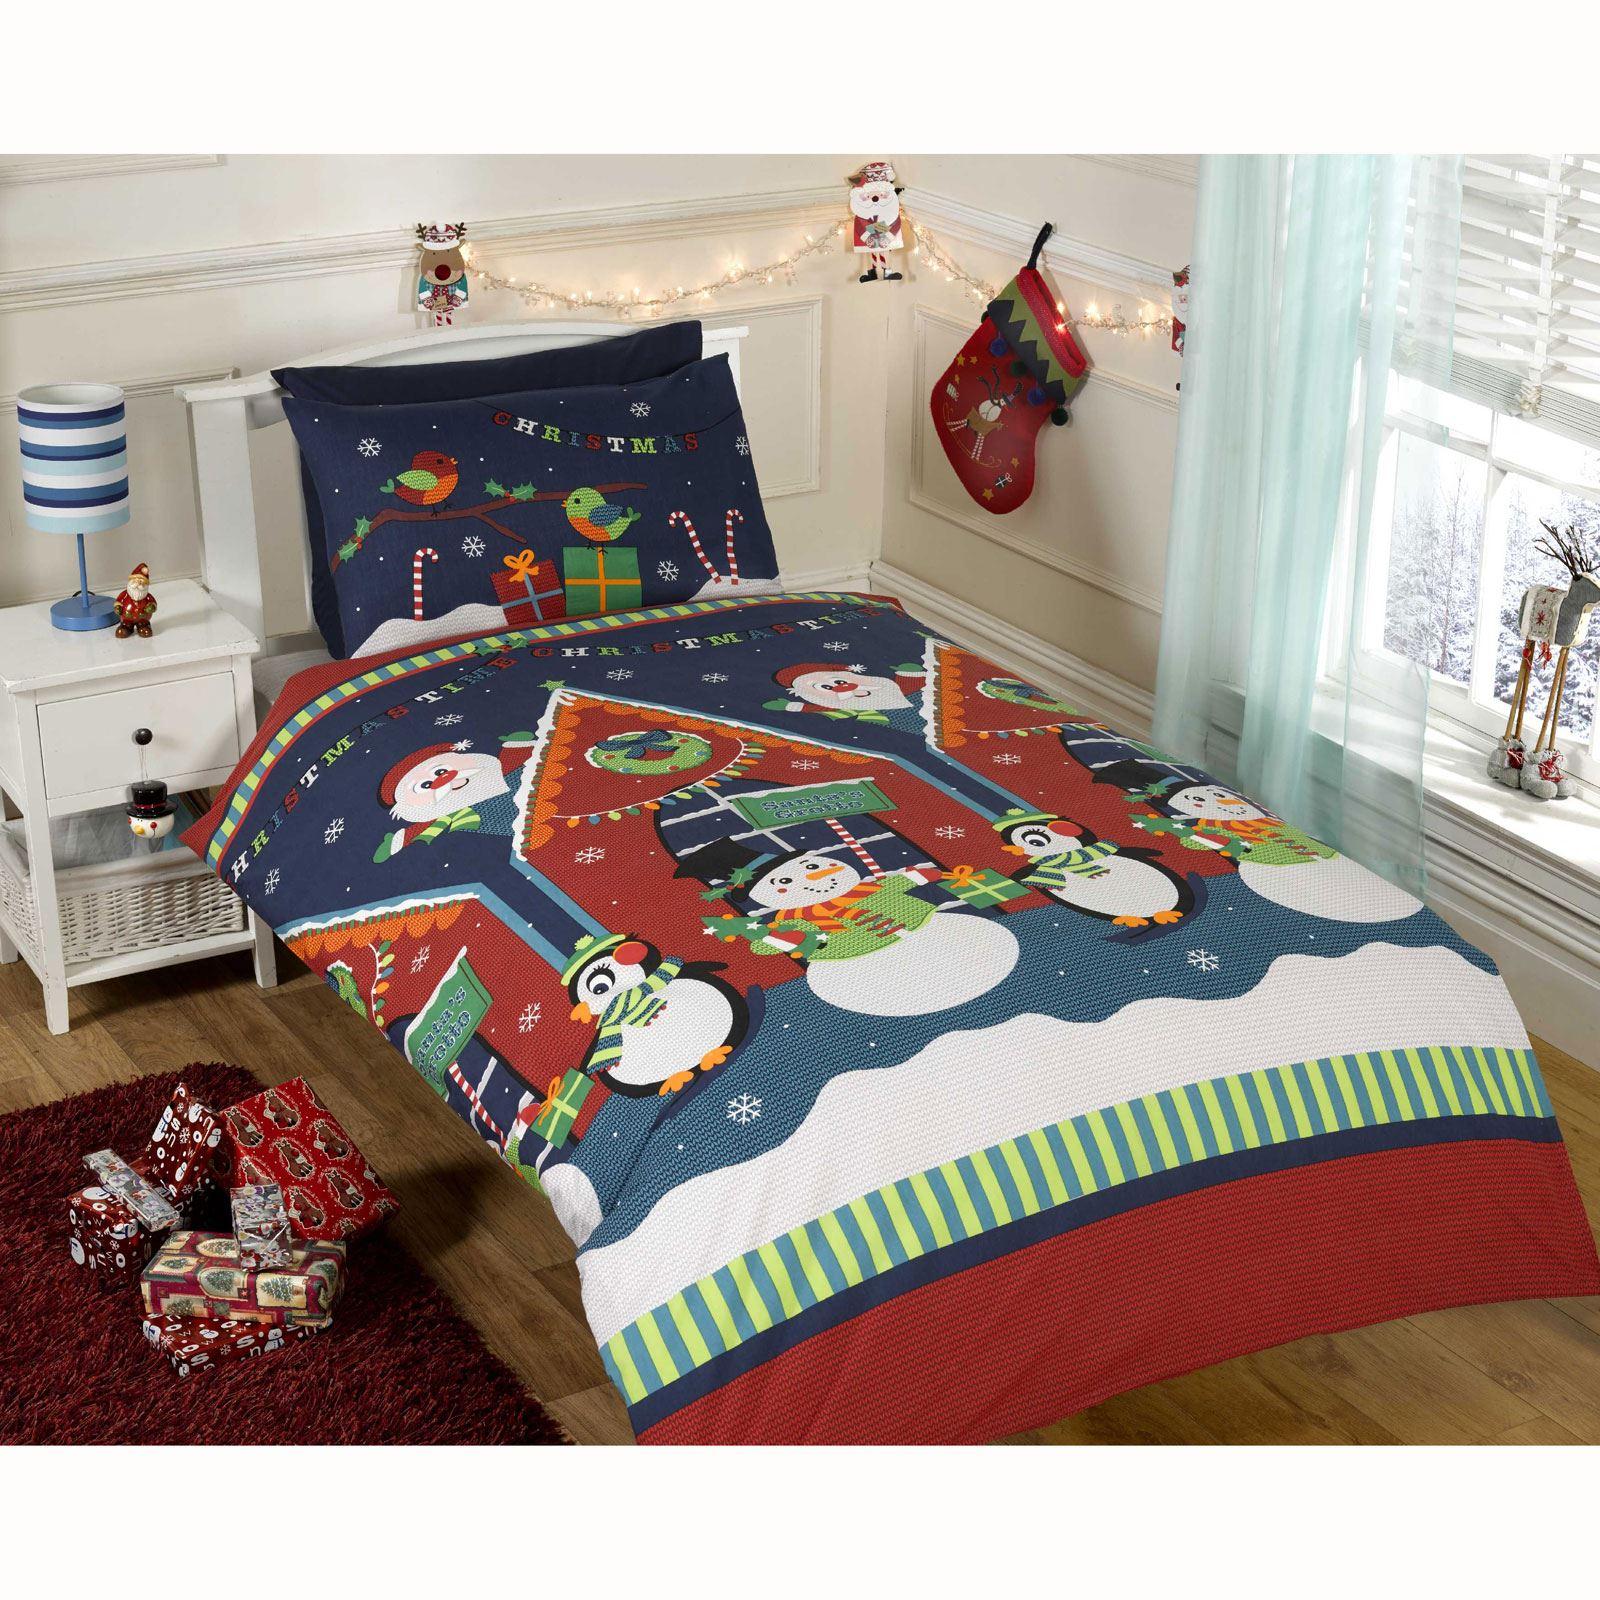 Christmas Duvet Cover Sets Various Styles Snowman Santa